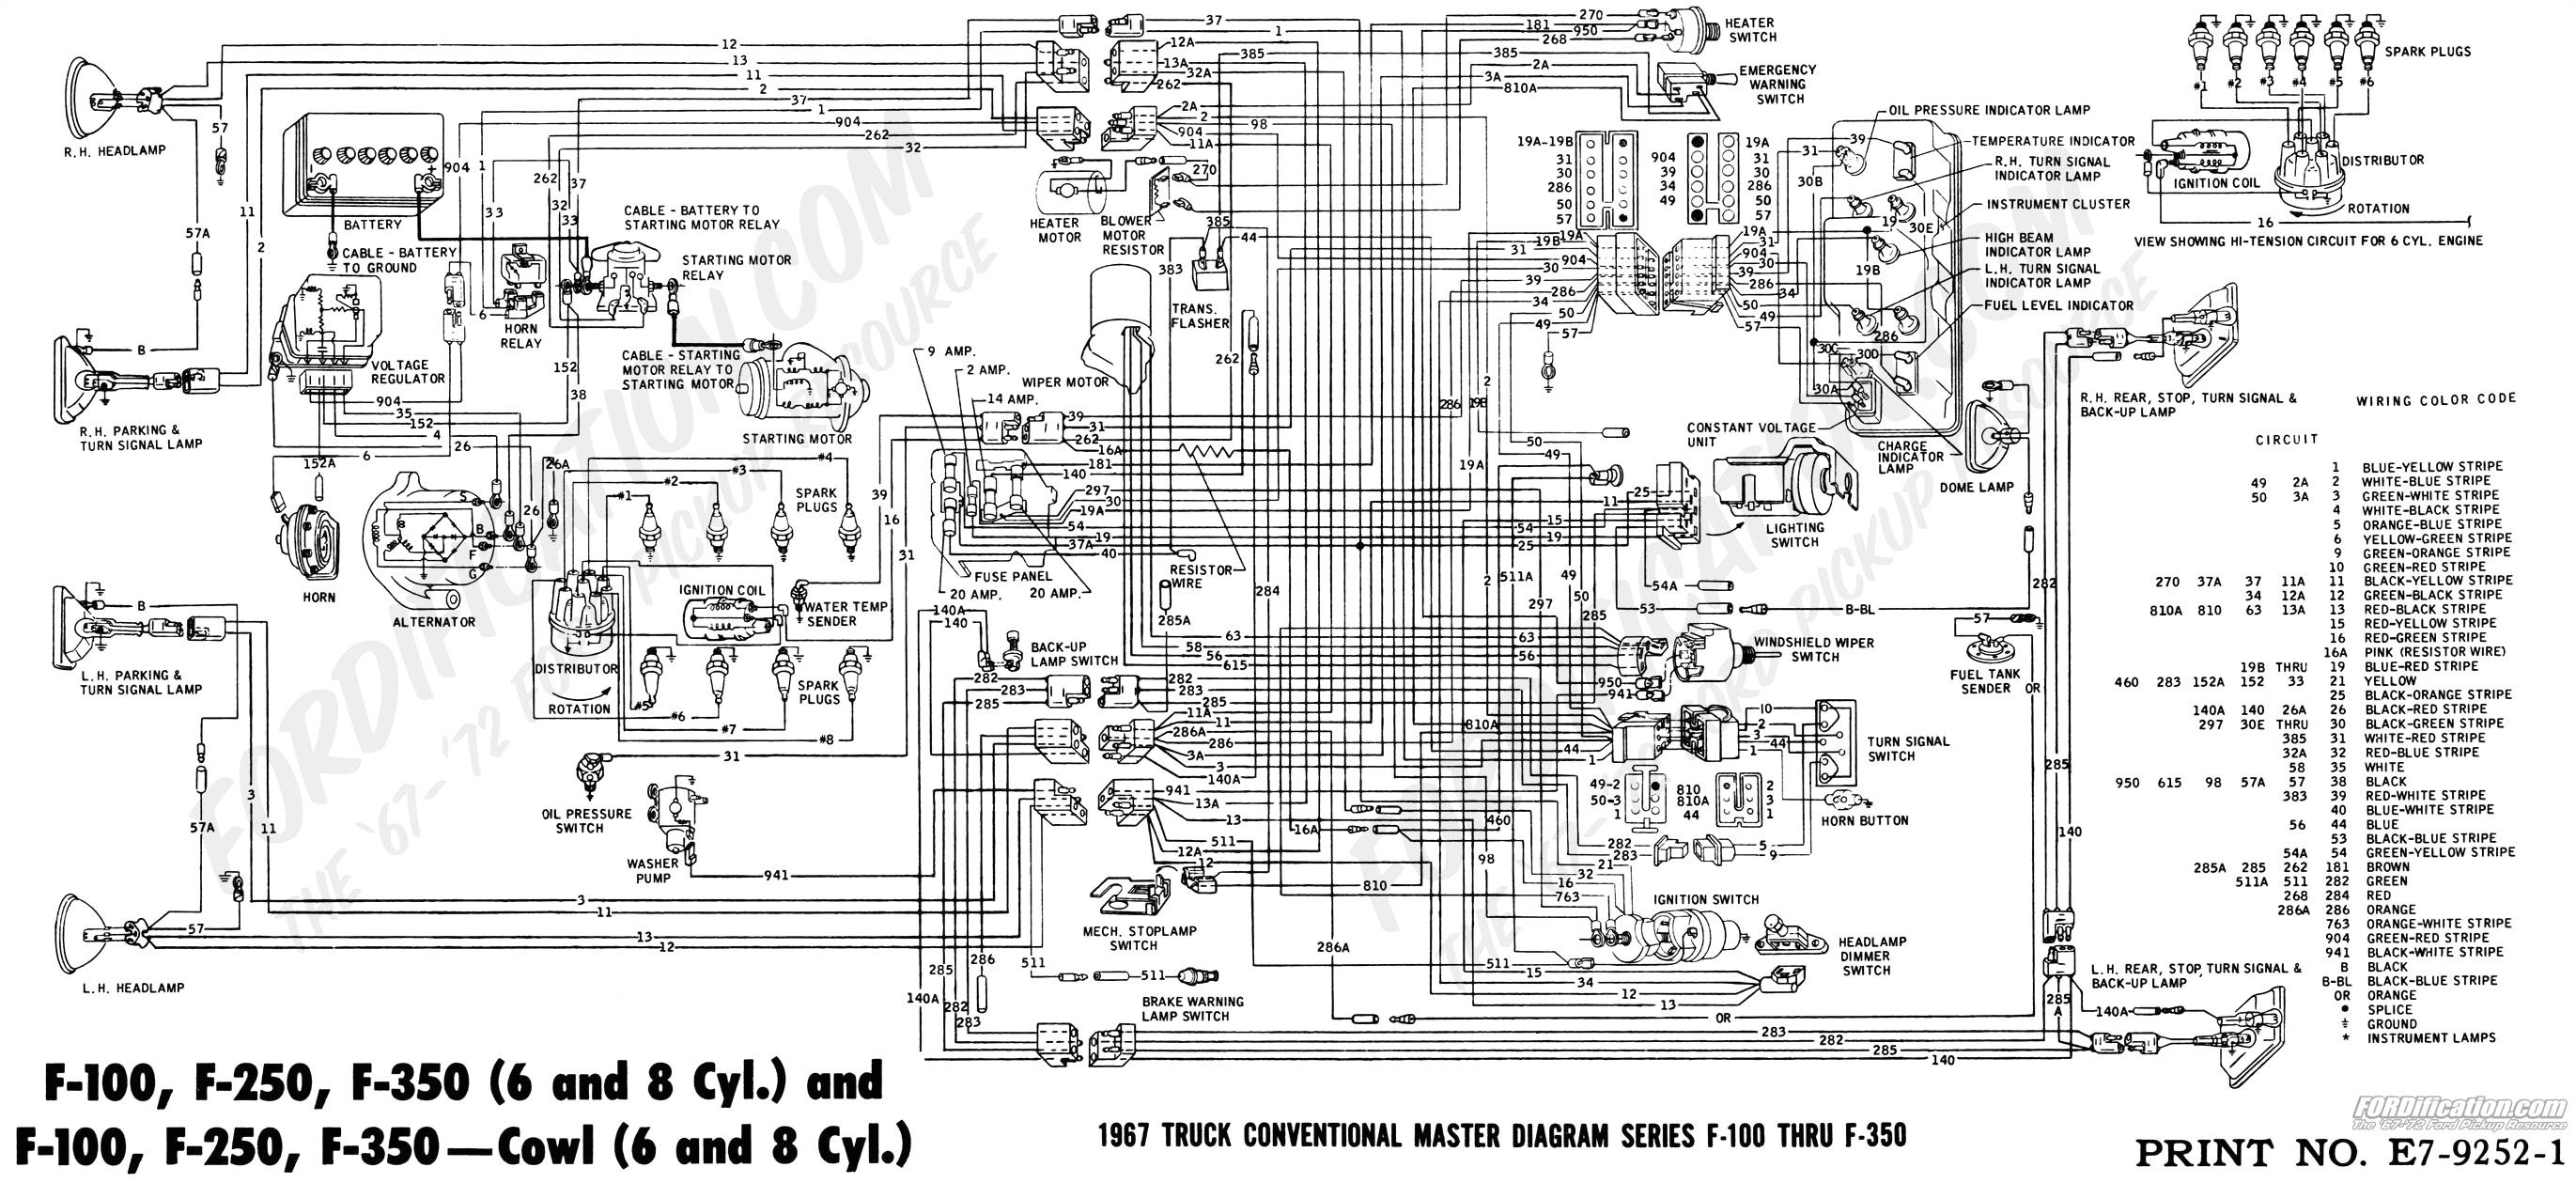 1990 f250 truck wiring diagram wiring diagram centre 1968 ford f700 truck wiring diagrams wiring diagram